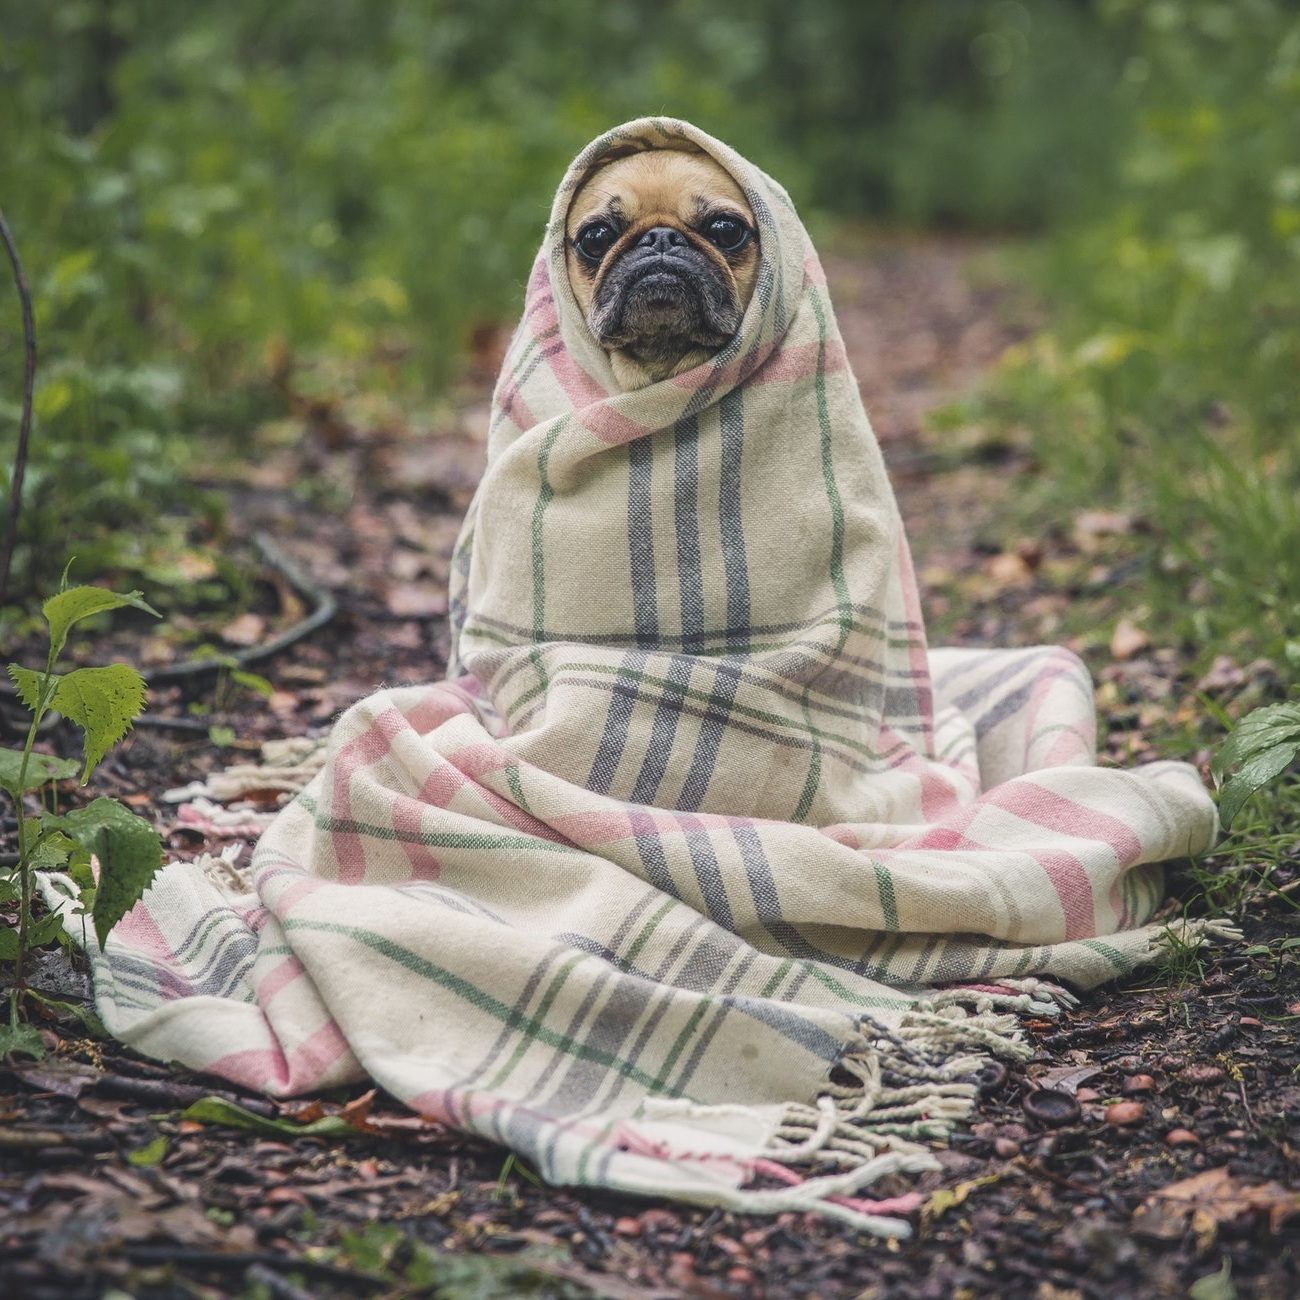 pug+in+blanket.jpg